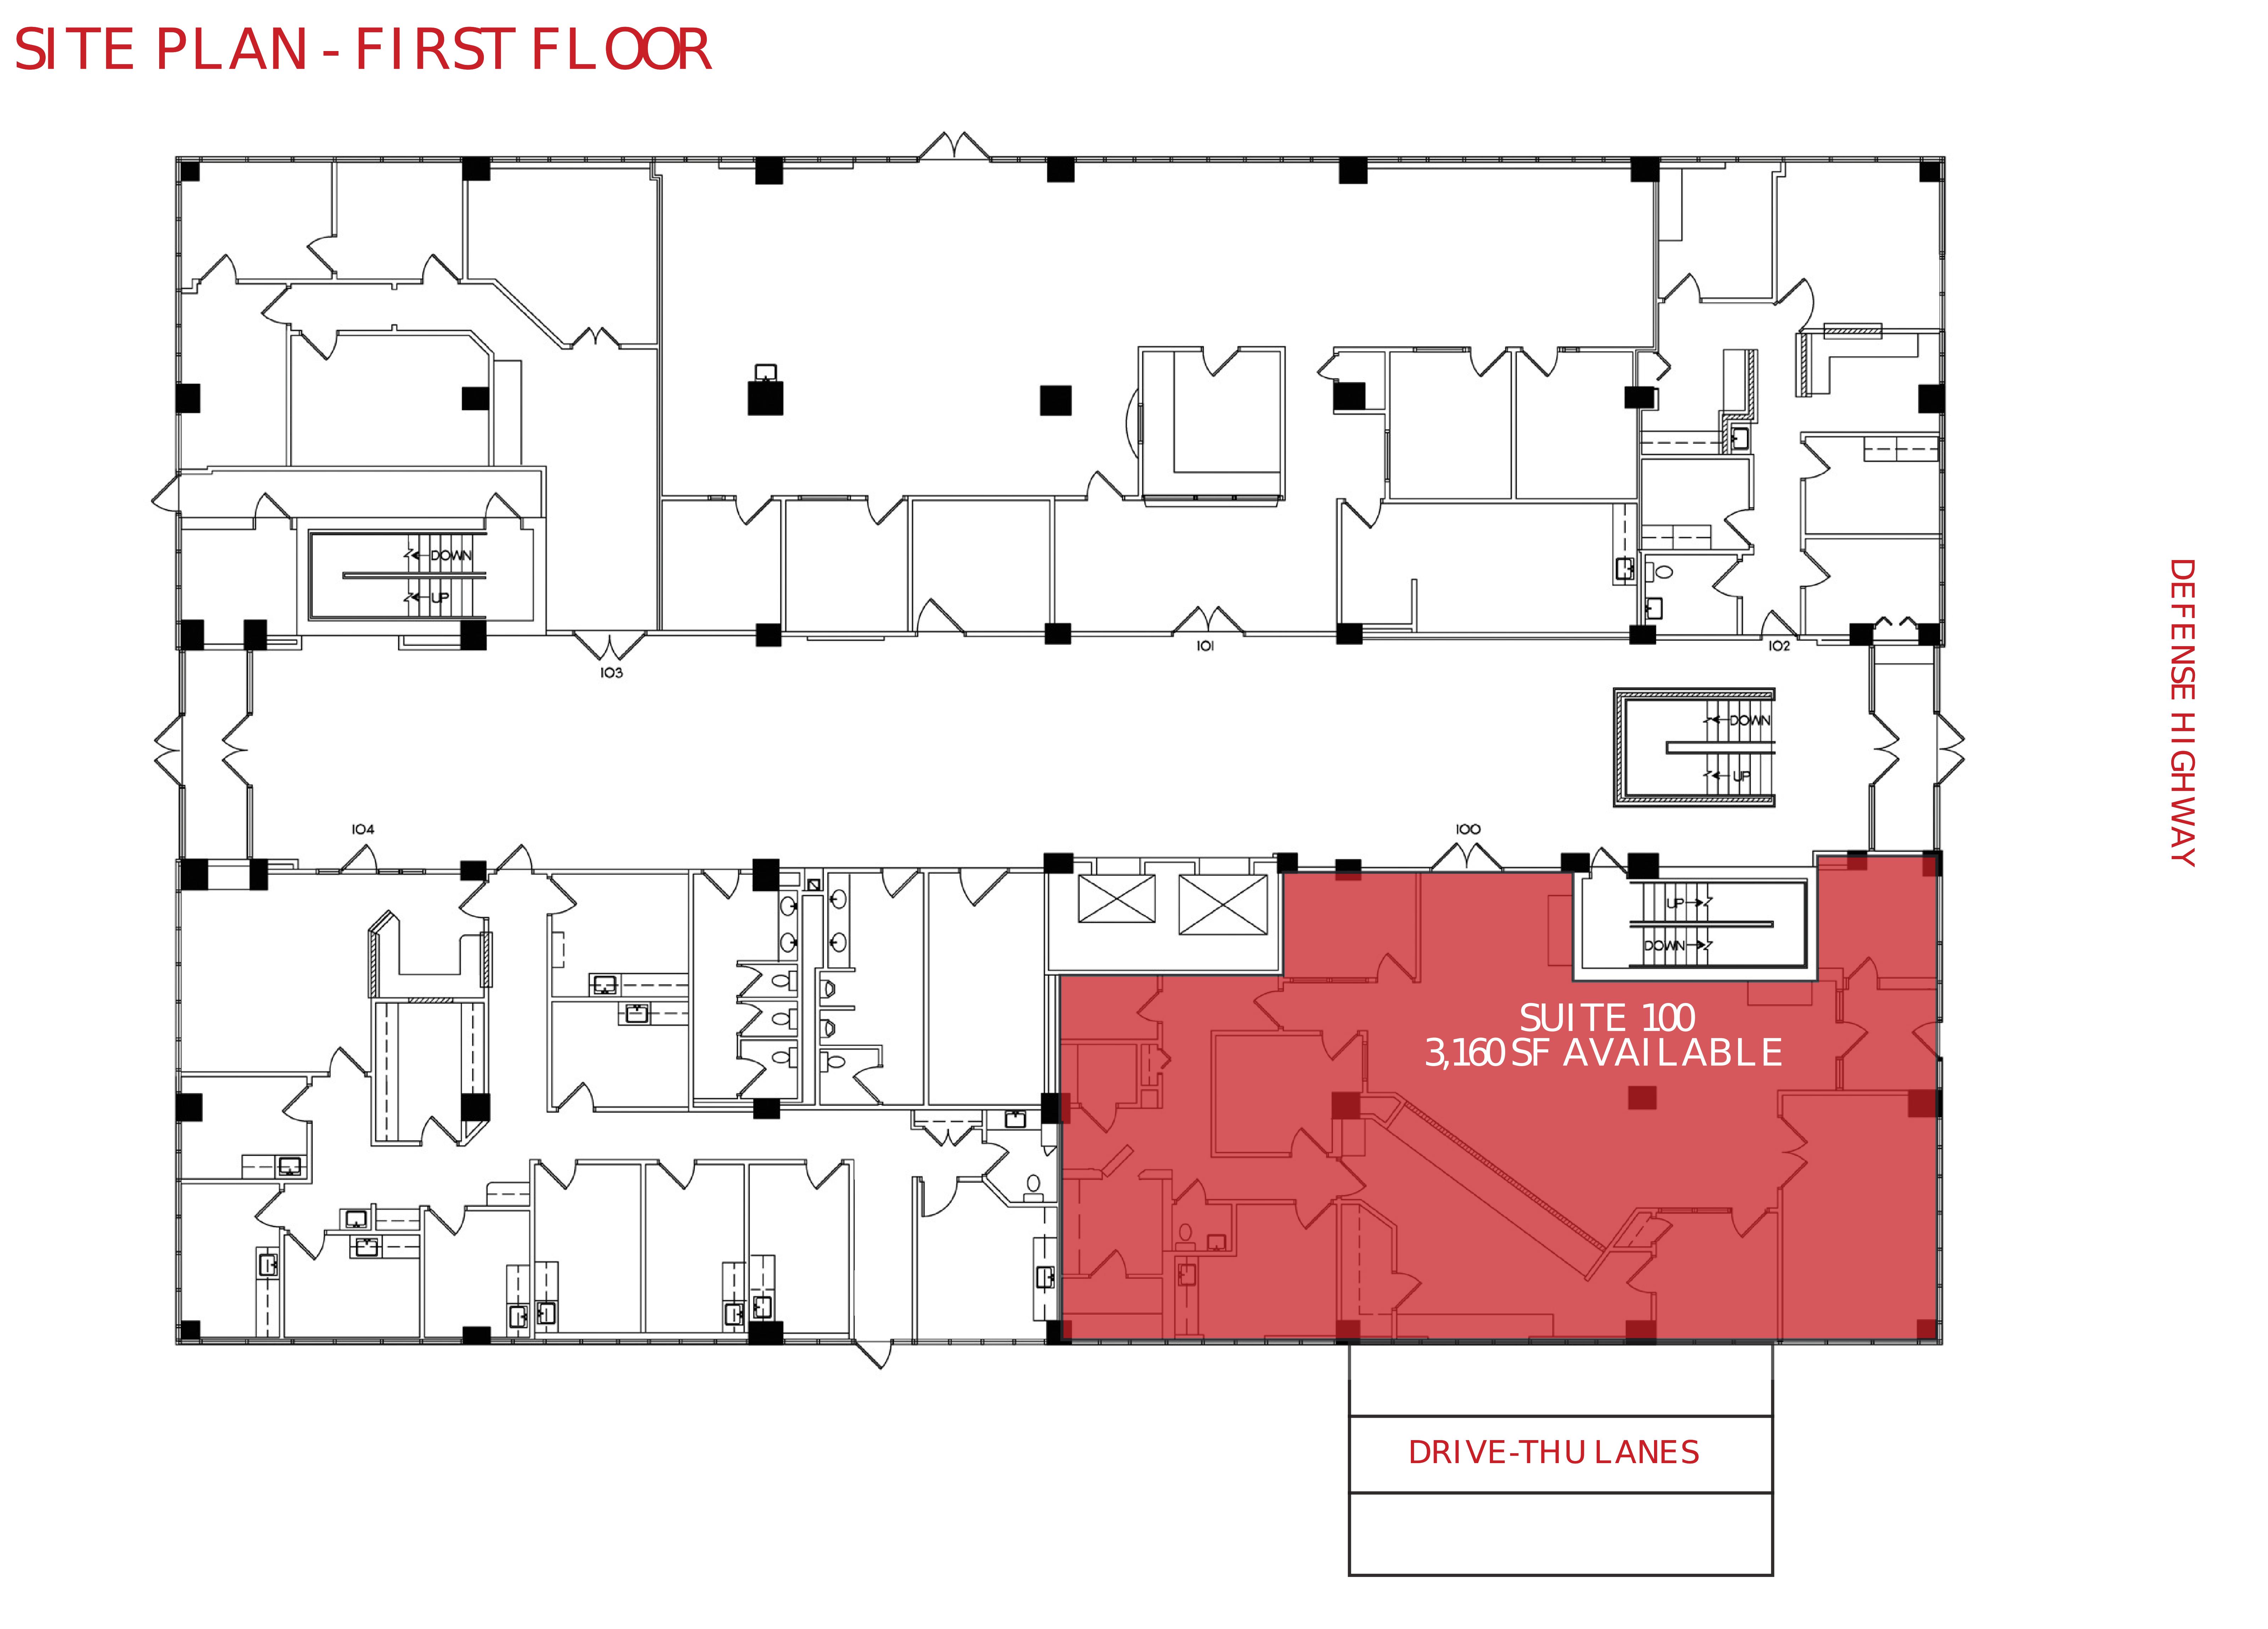 116 Defense Hwy: site plan